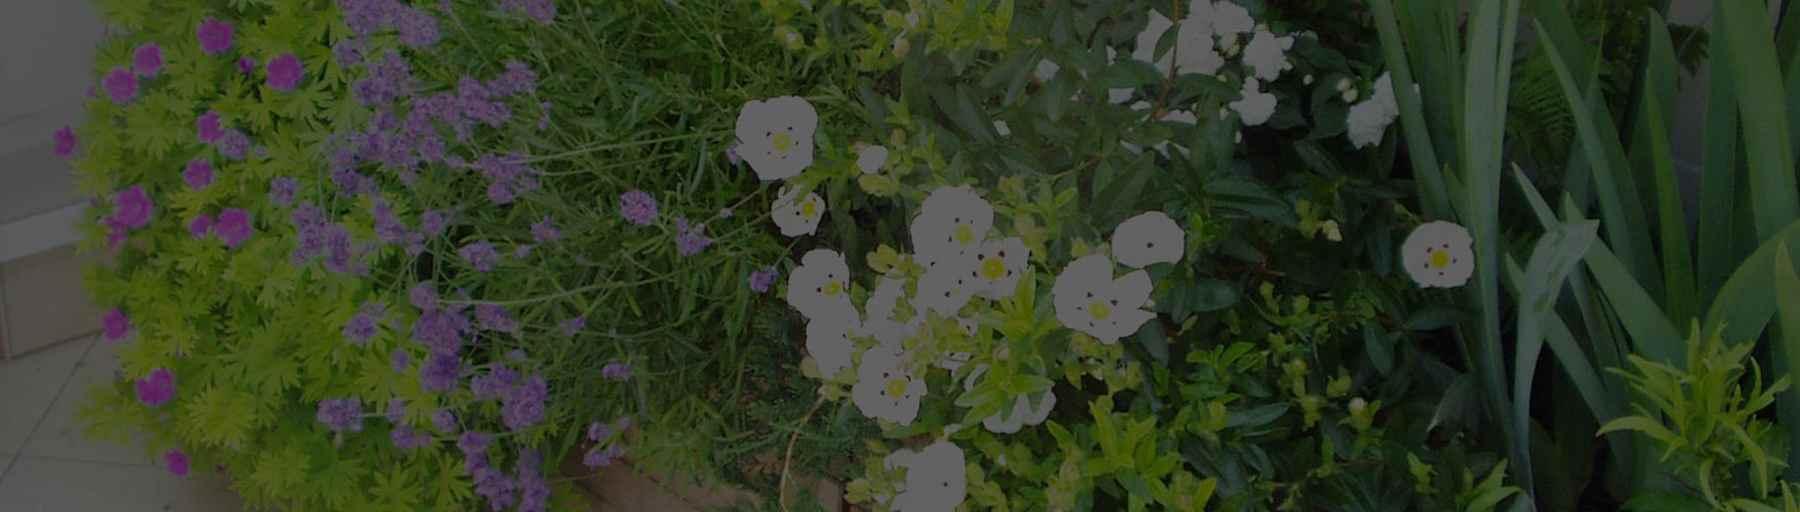 Paysagiste jardiniere paris 10 creation jardin for Paysagiste boulogne billancourt